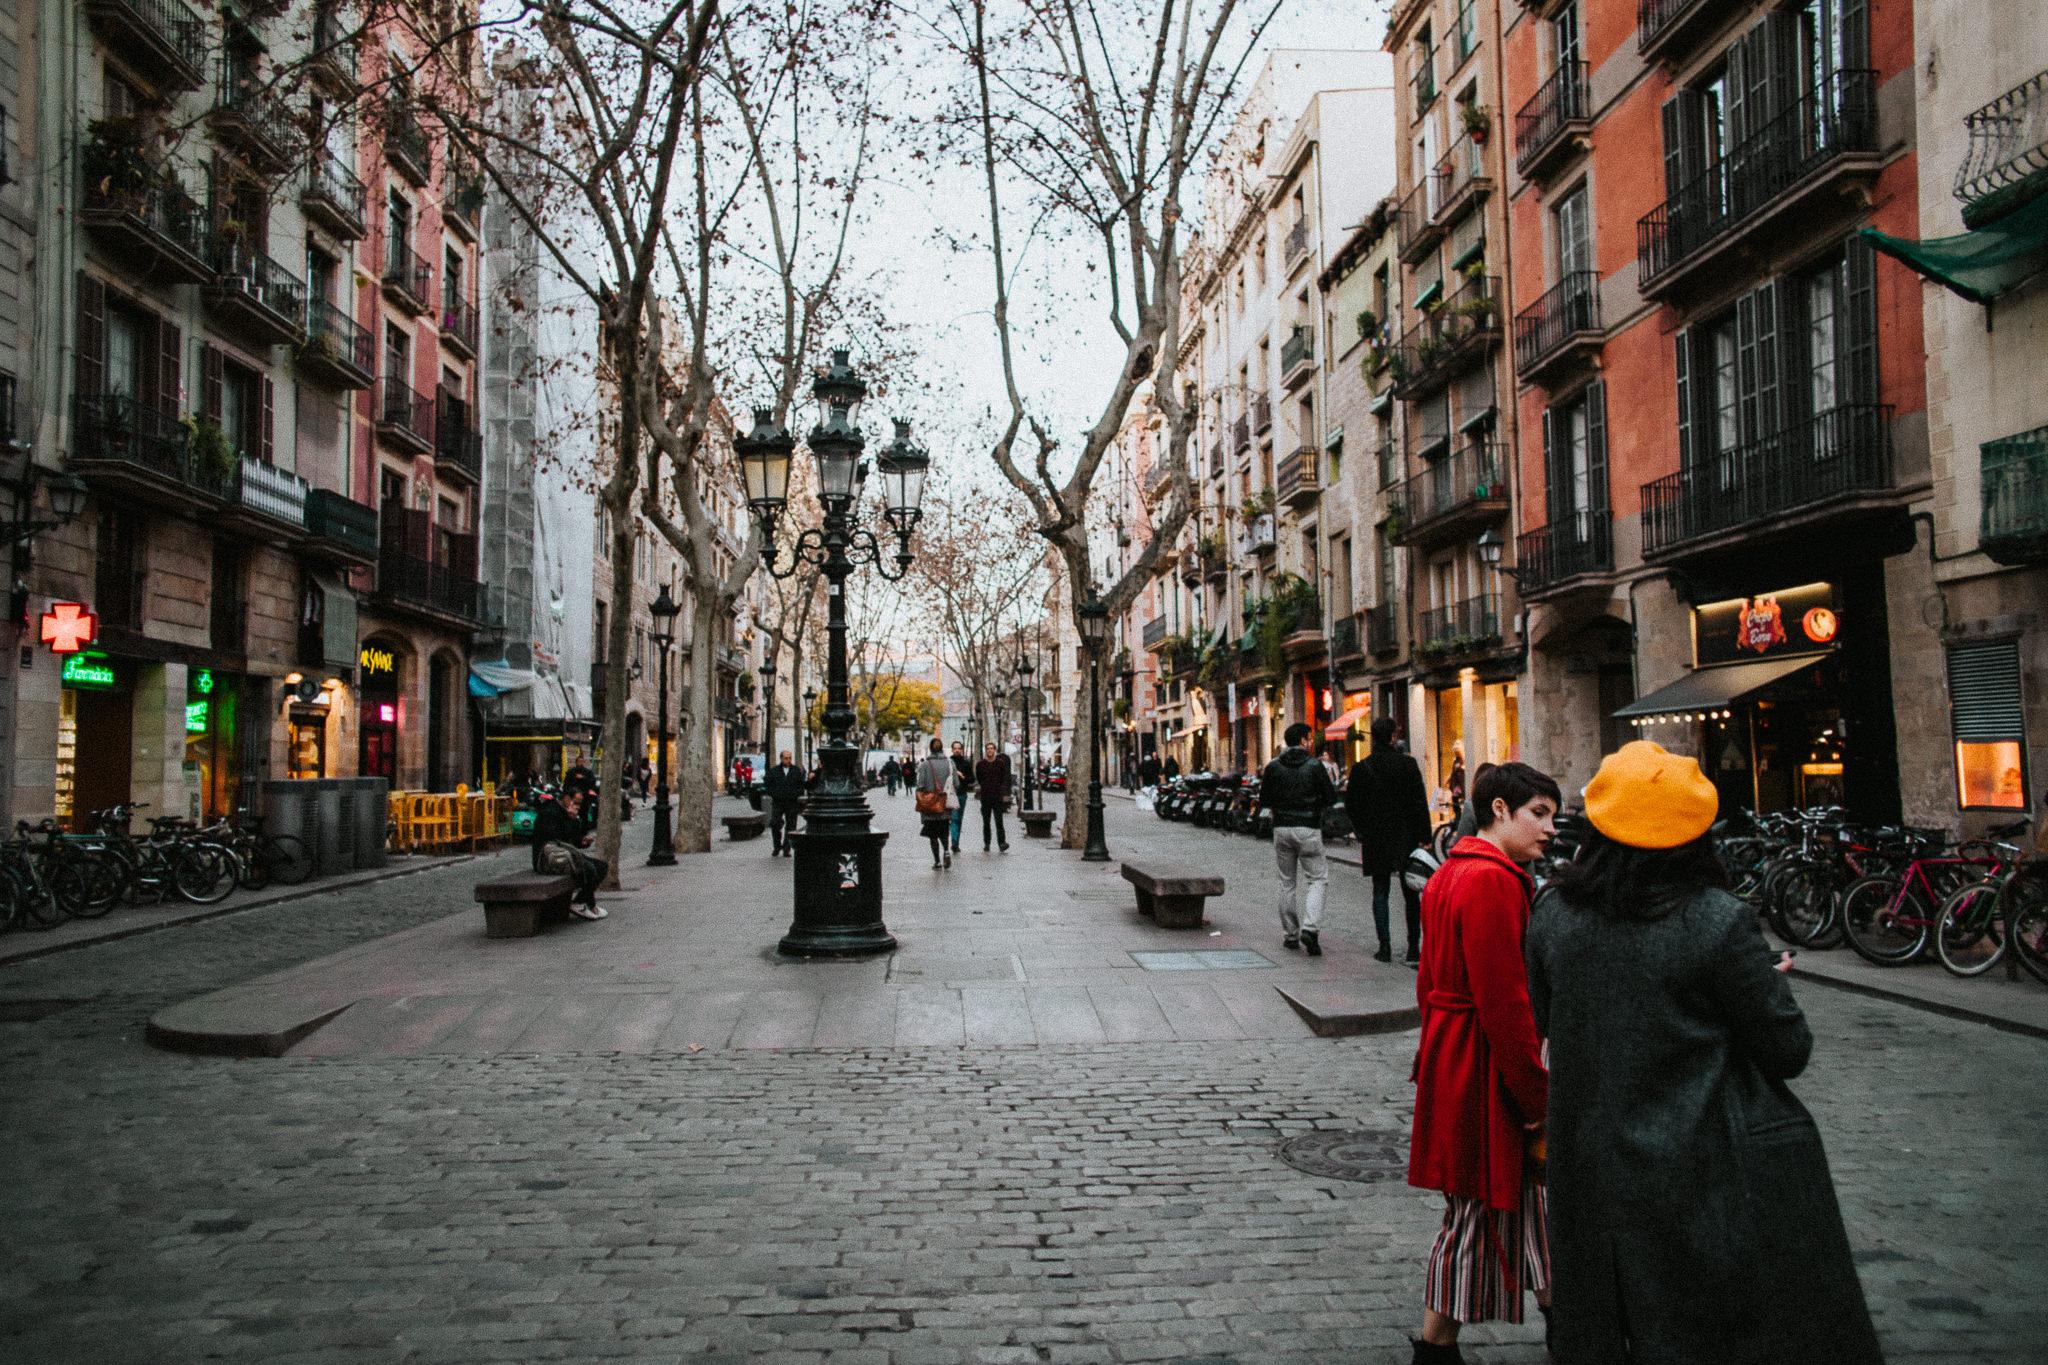 Barcelona-destination-photographer-alfred-tang-22.jpg